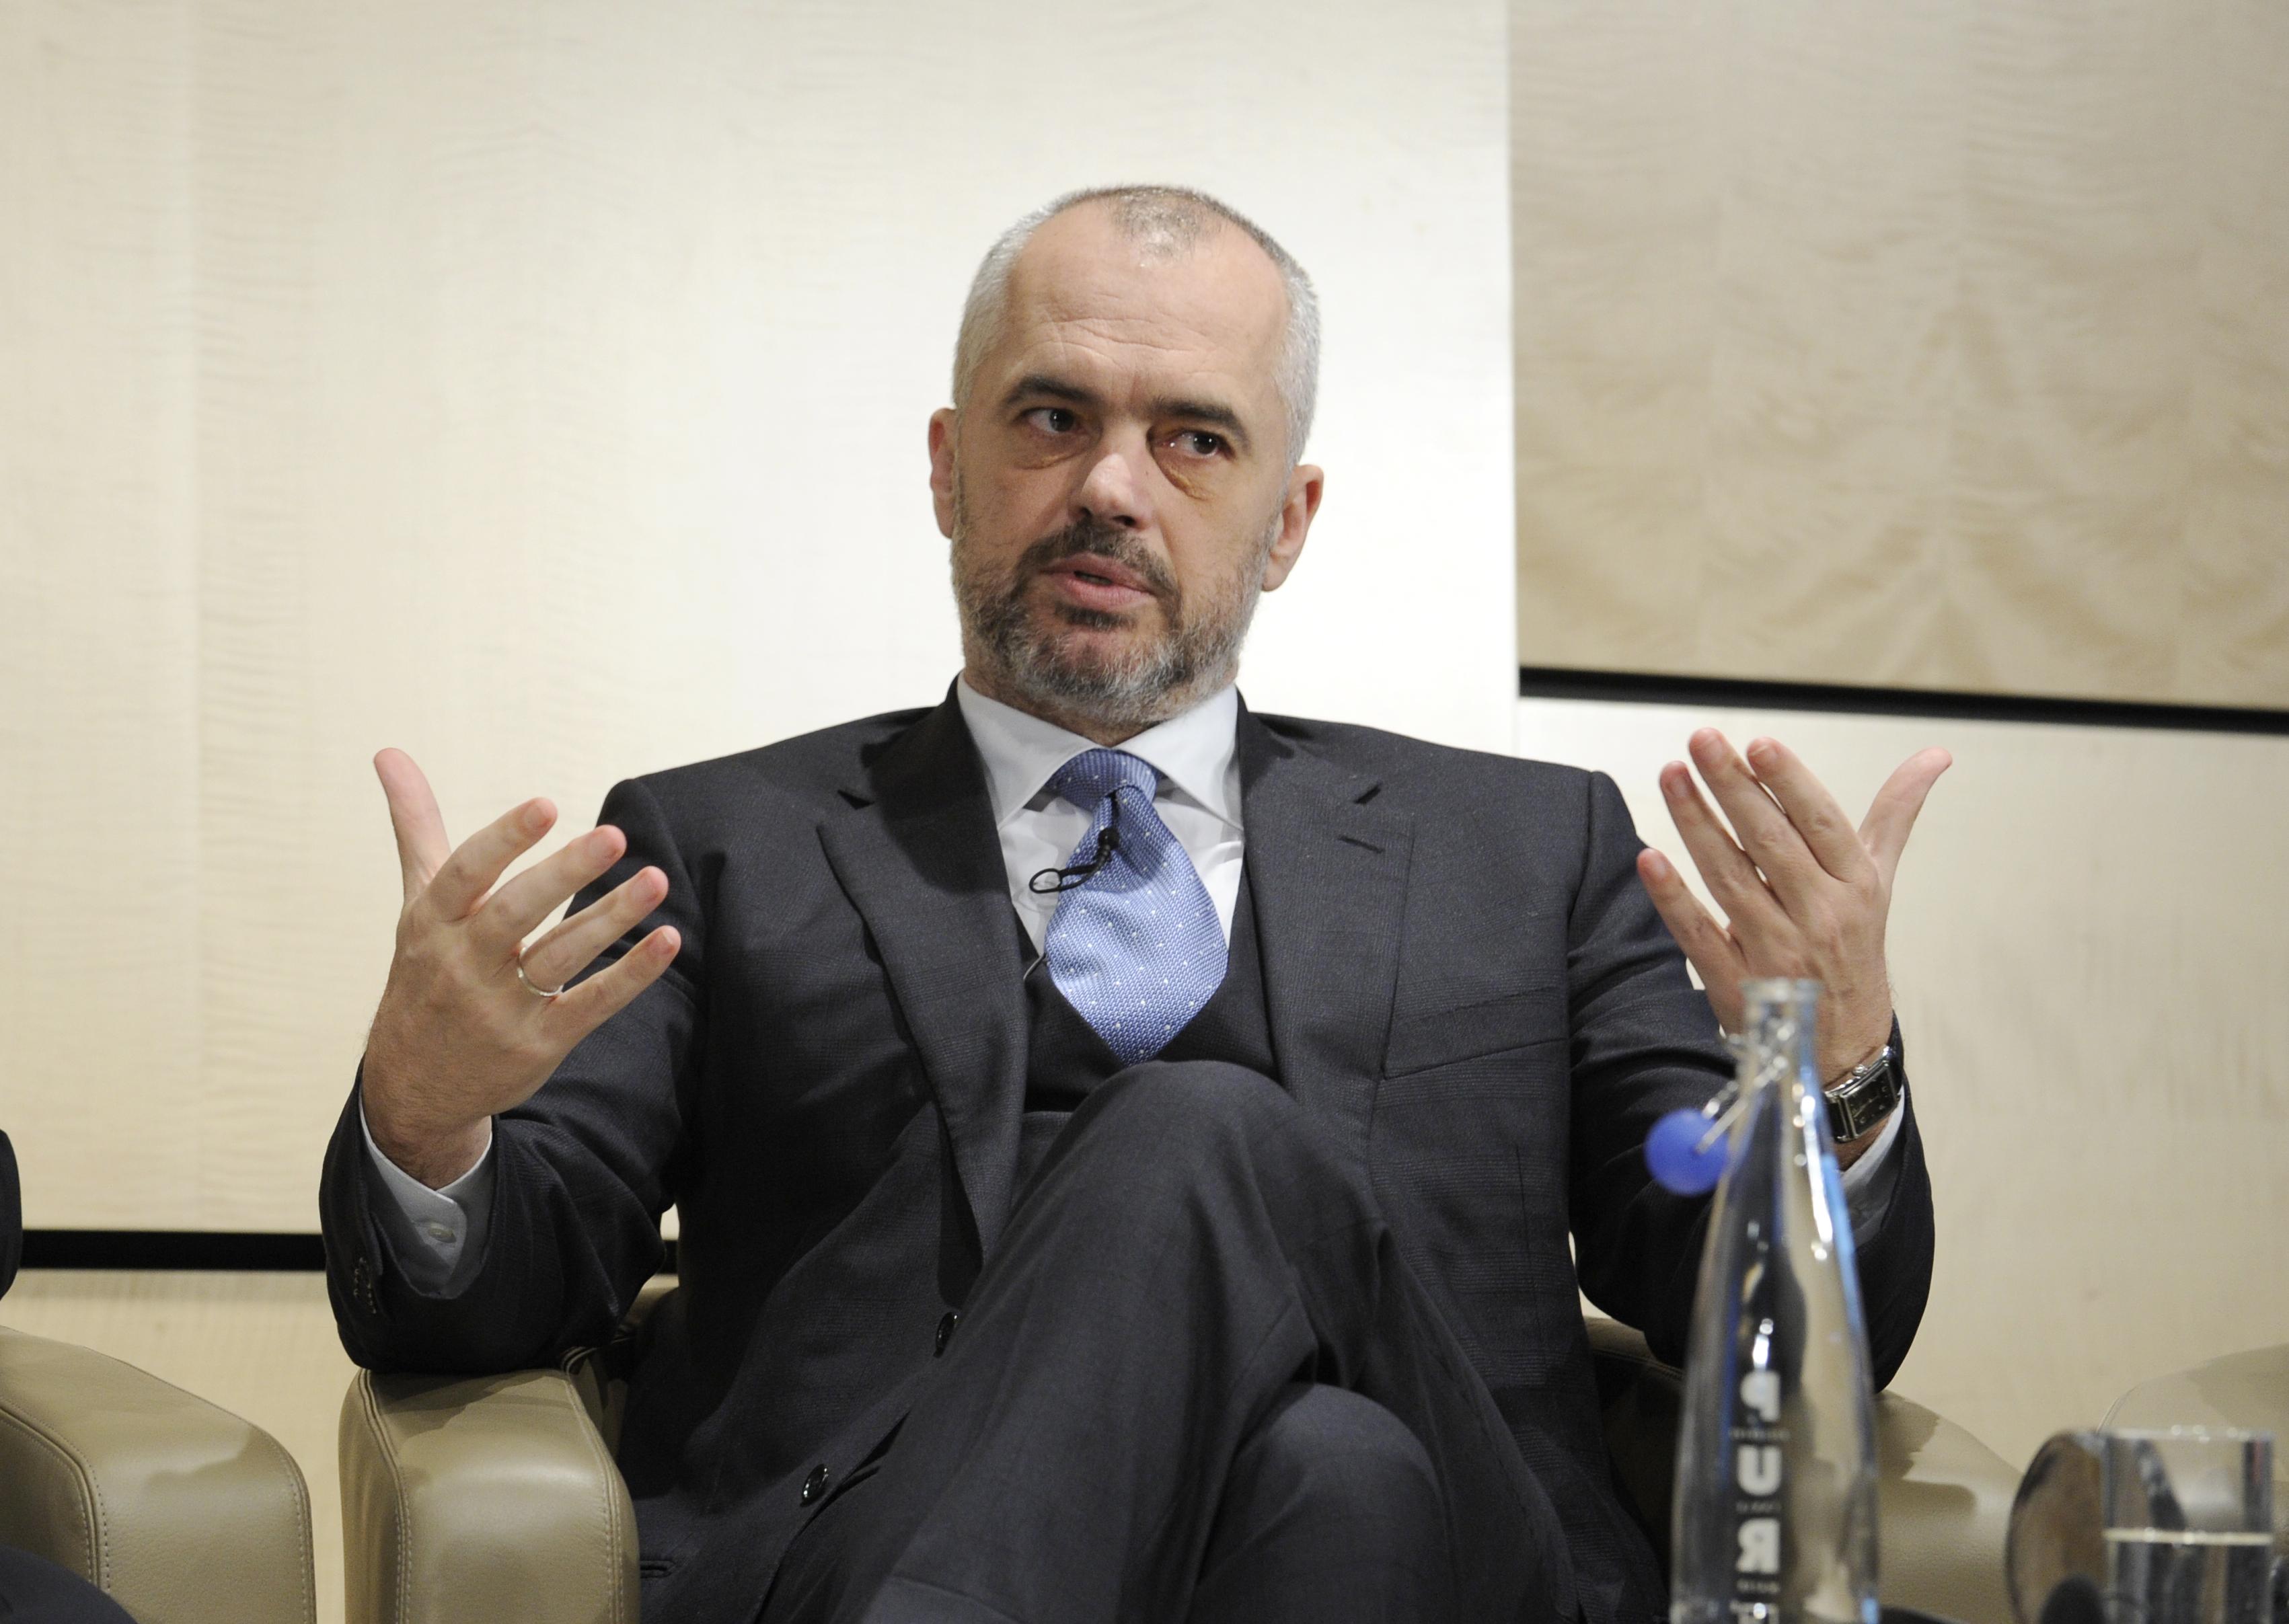 Edi Rama, Prime Minister of Albania at the Western Balkan Investment Forum (via EBRD)